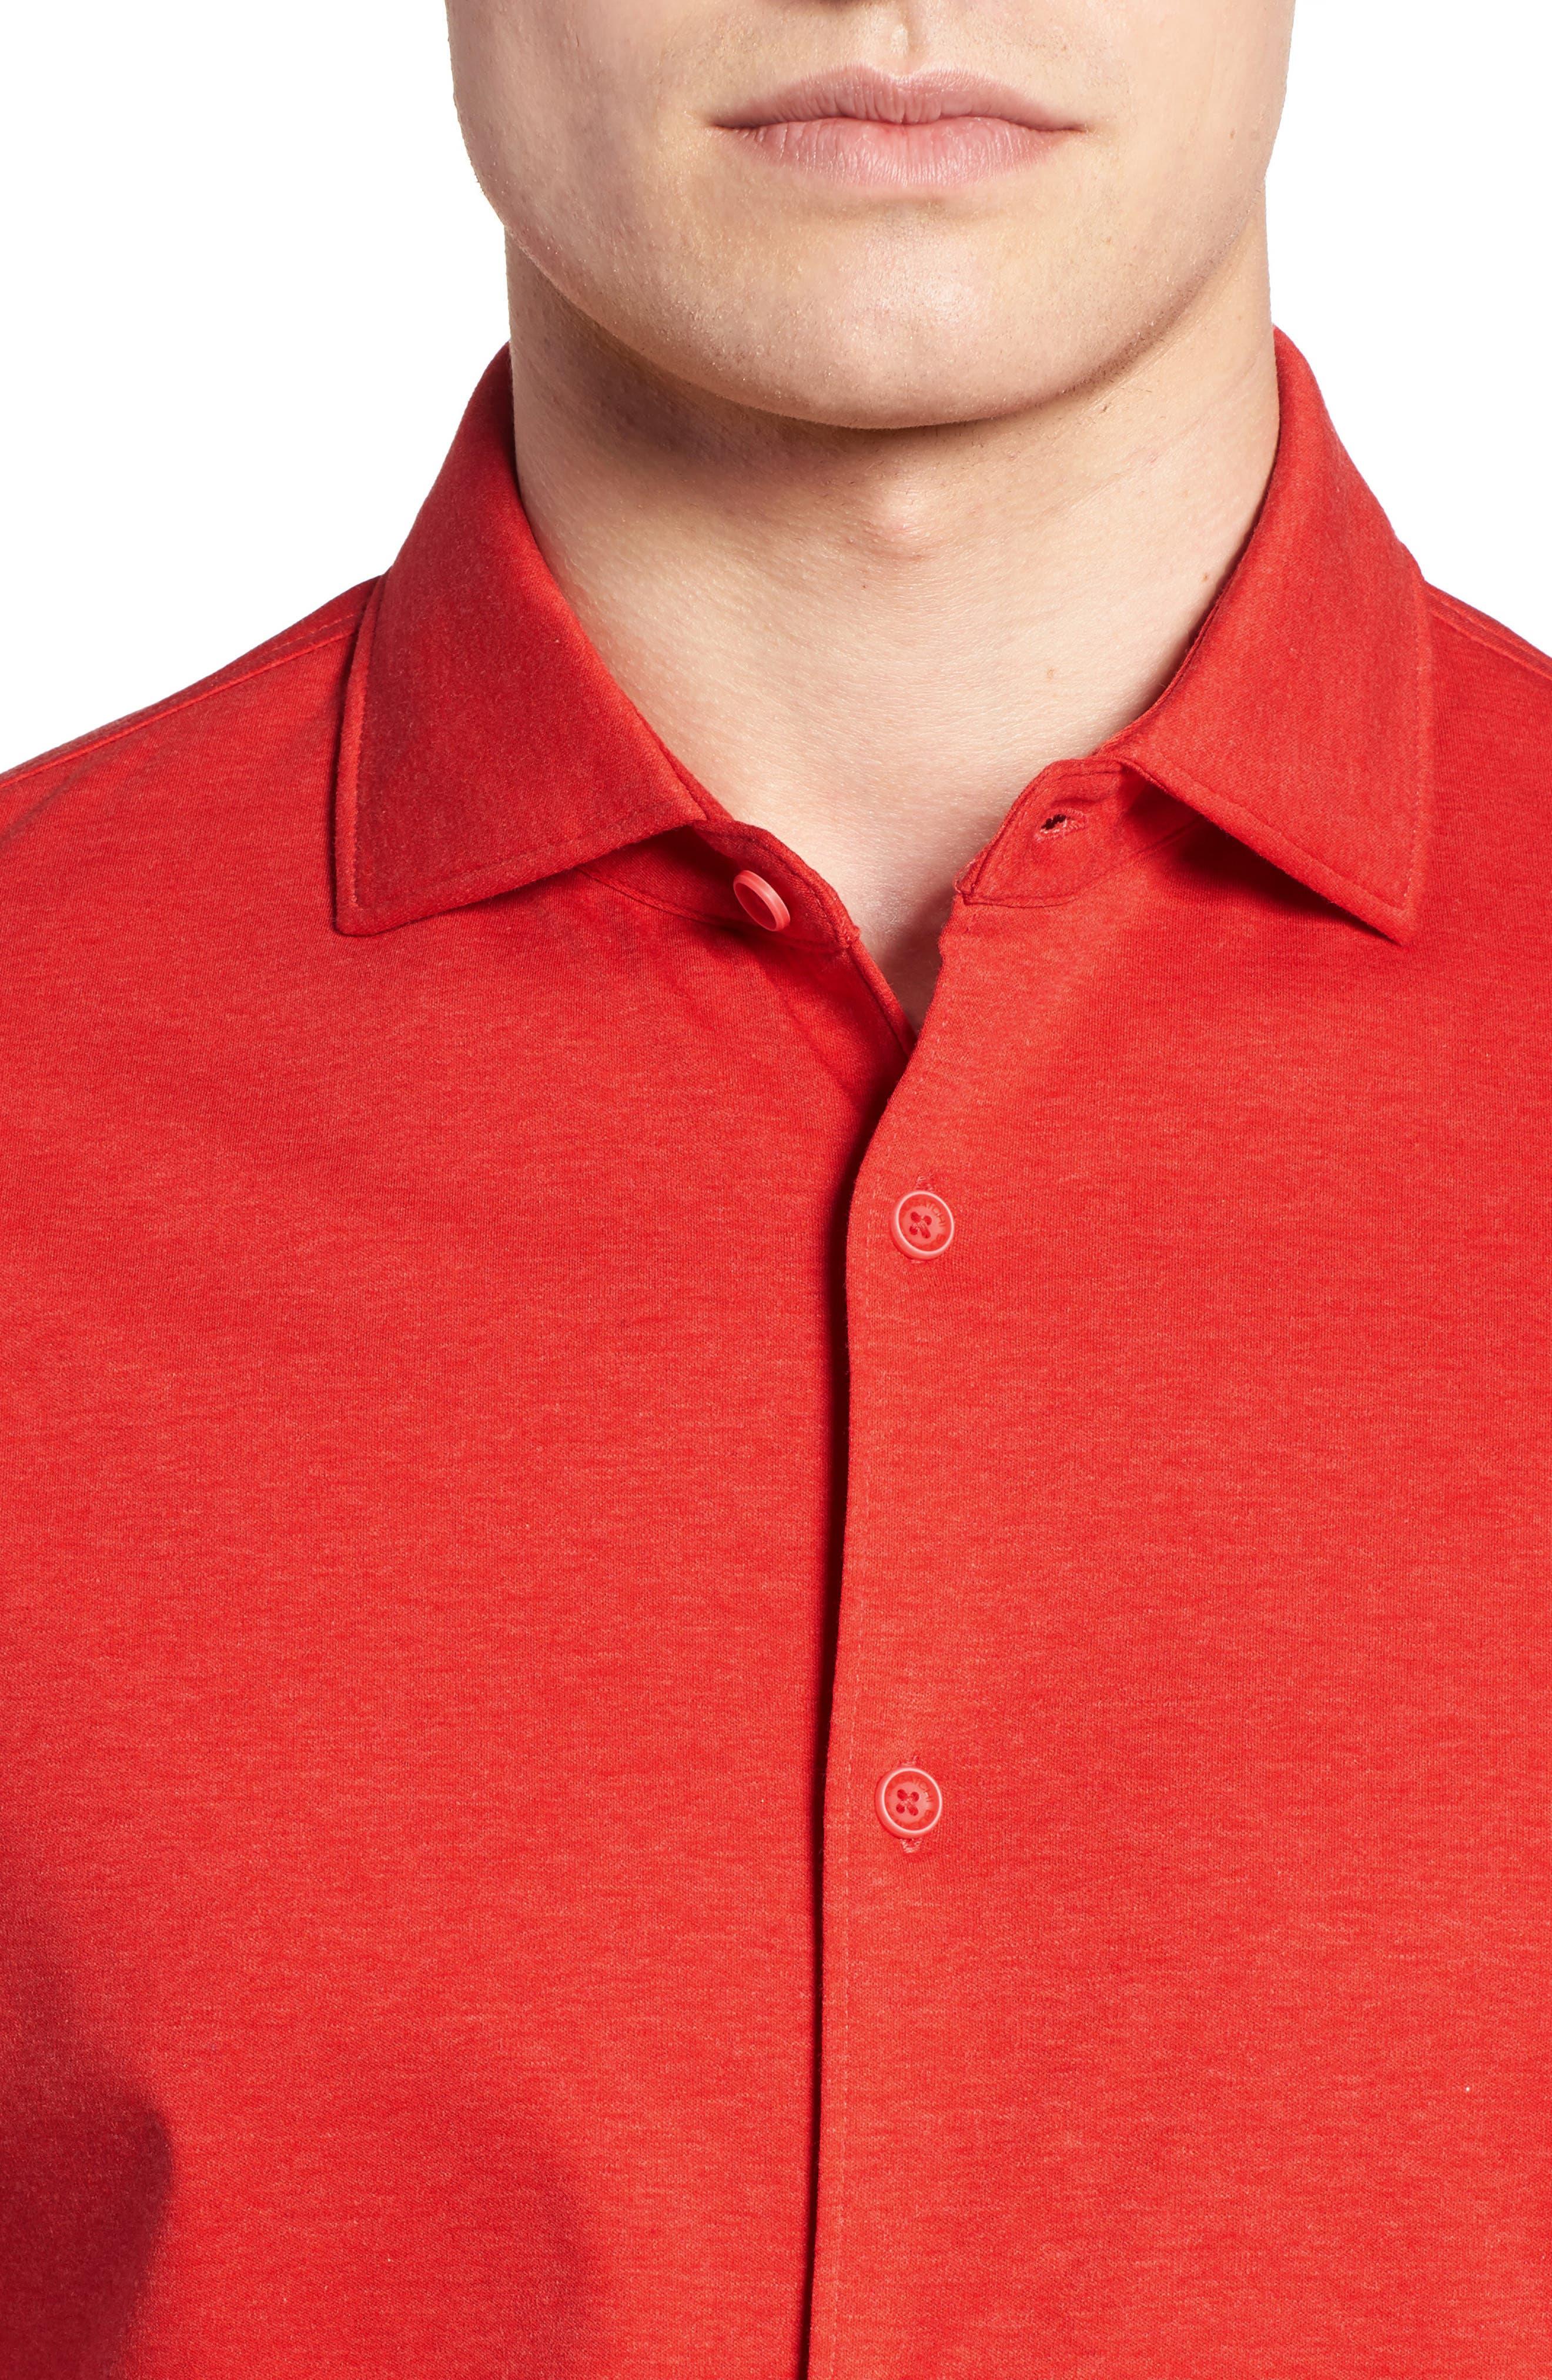 Trim Fit Heather Knit Sport Shirt,                             Alternate thumbnail 4, color,                             Cherry